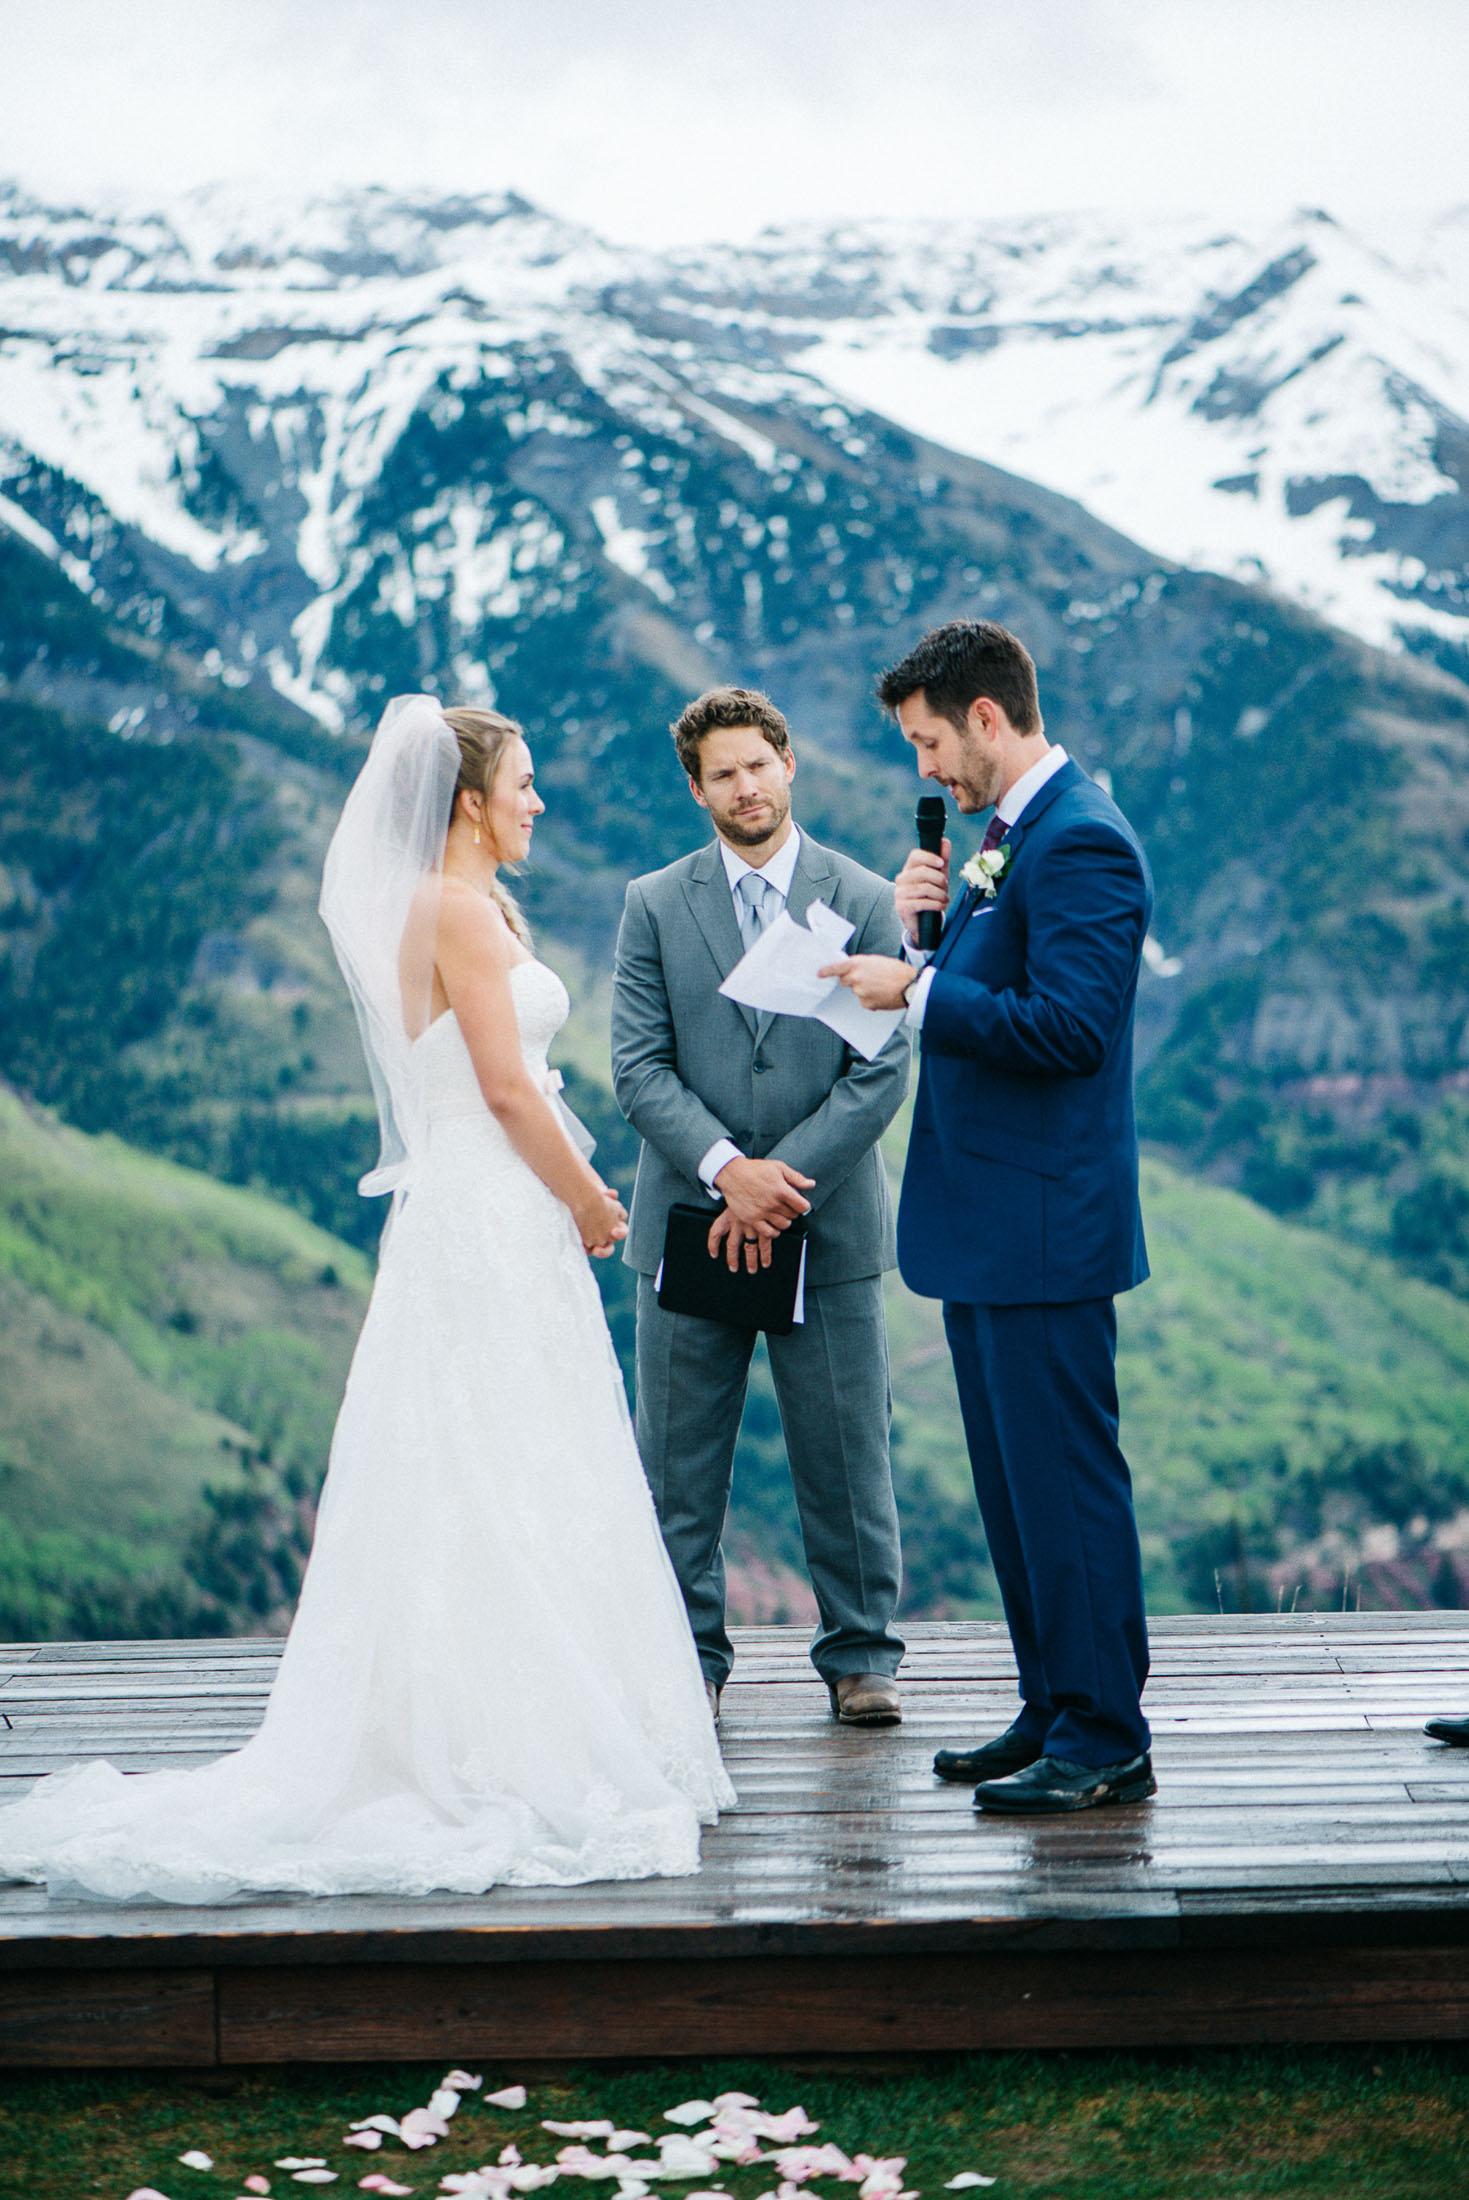 101elopement-photographer-colorado-telluride_wedding_photographer_colorado_mountain_wedding_photographer_brie&tyler_1760.jpg